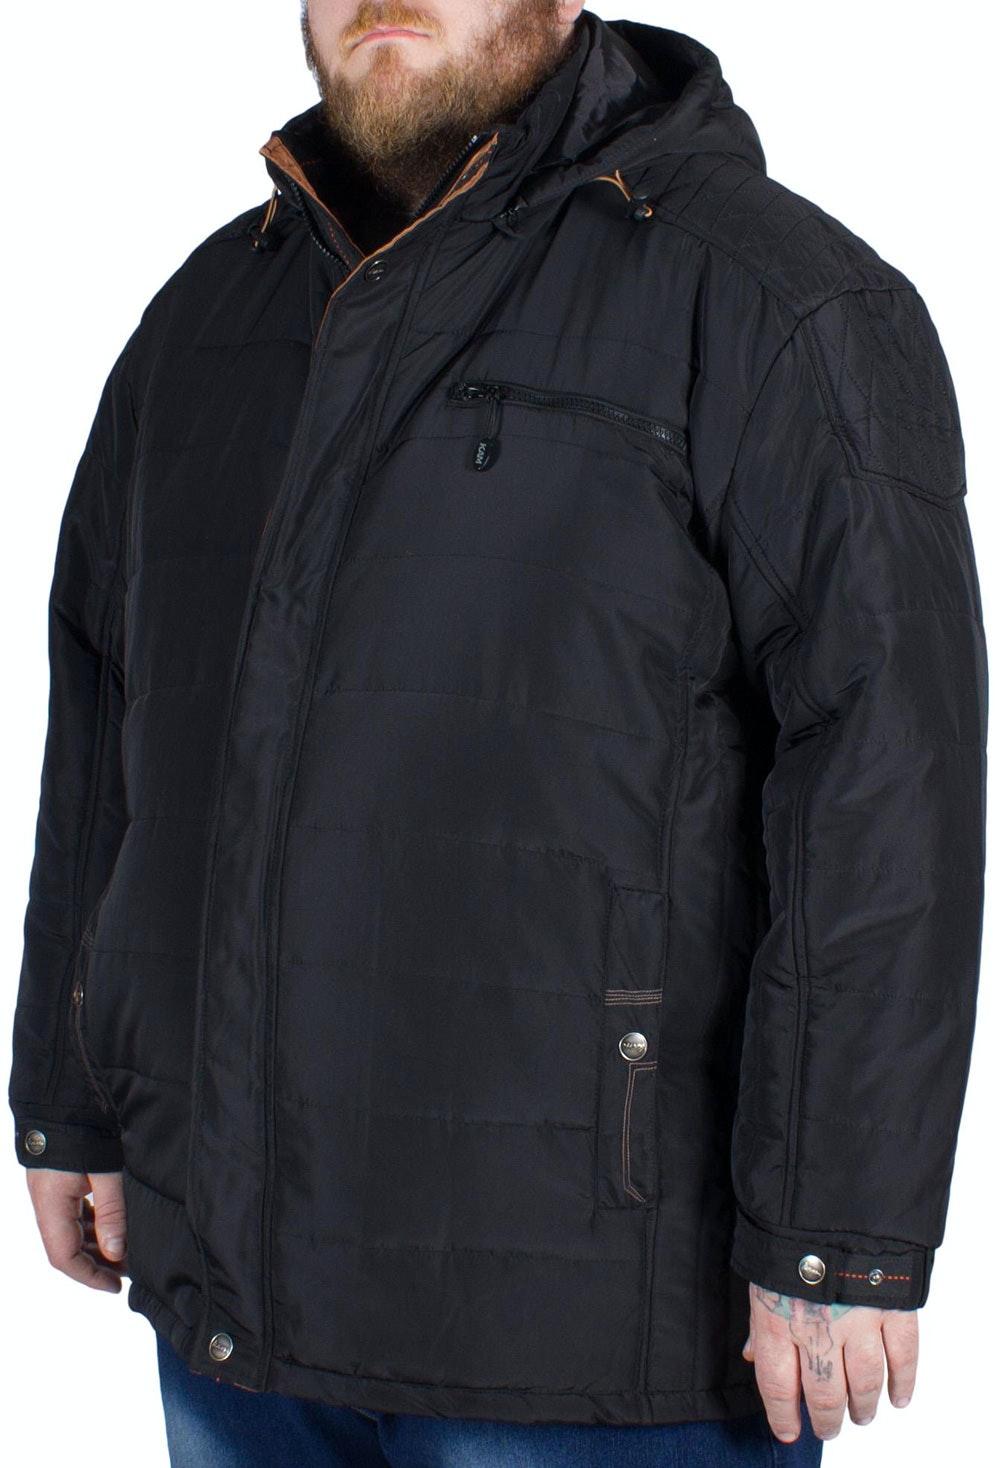 KAM Padded Coat Black Tall